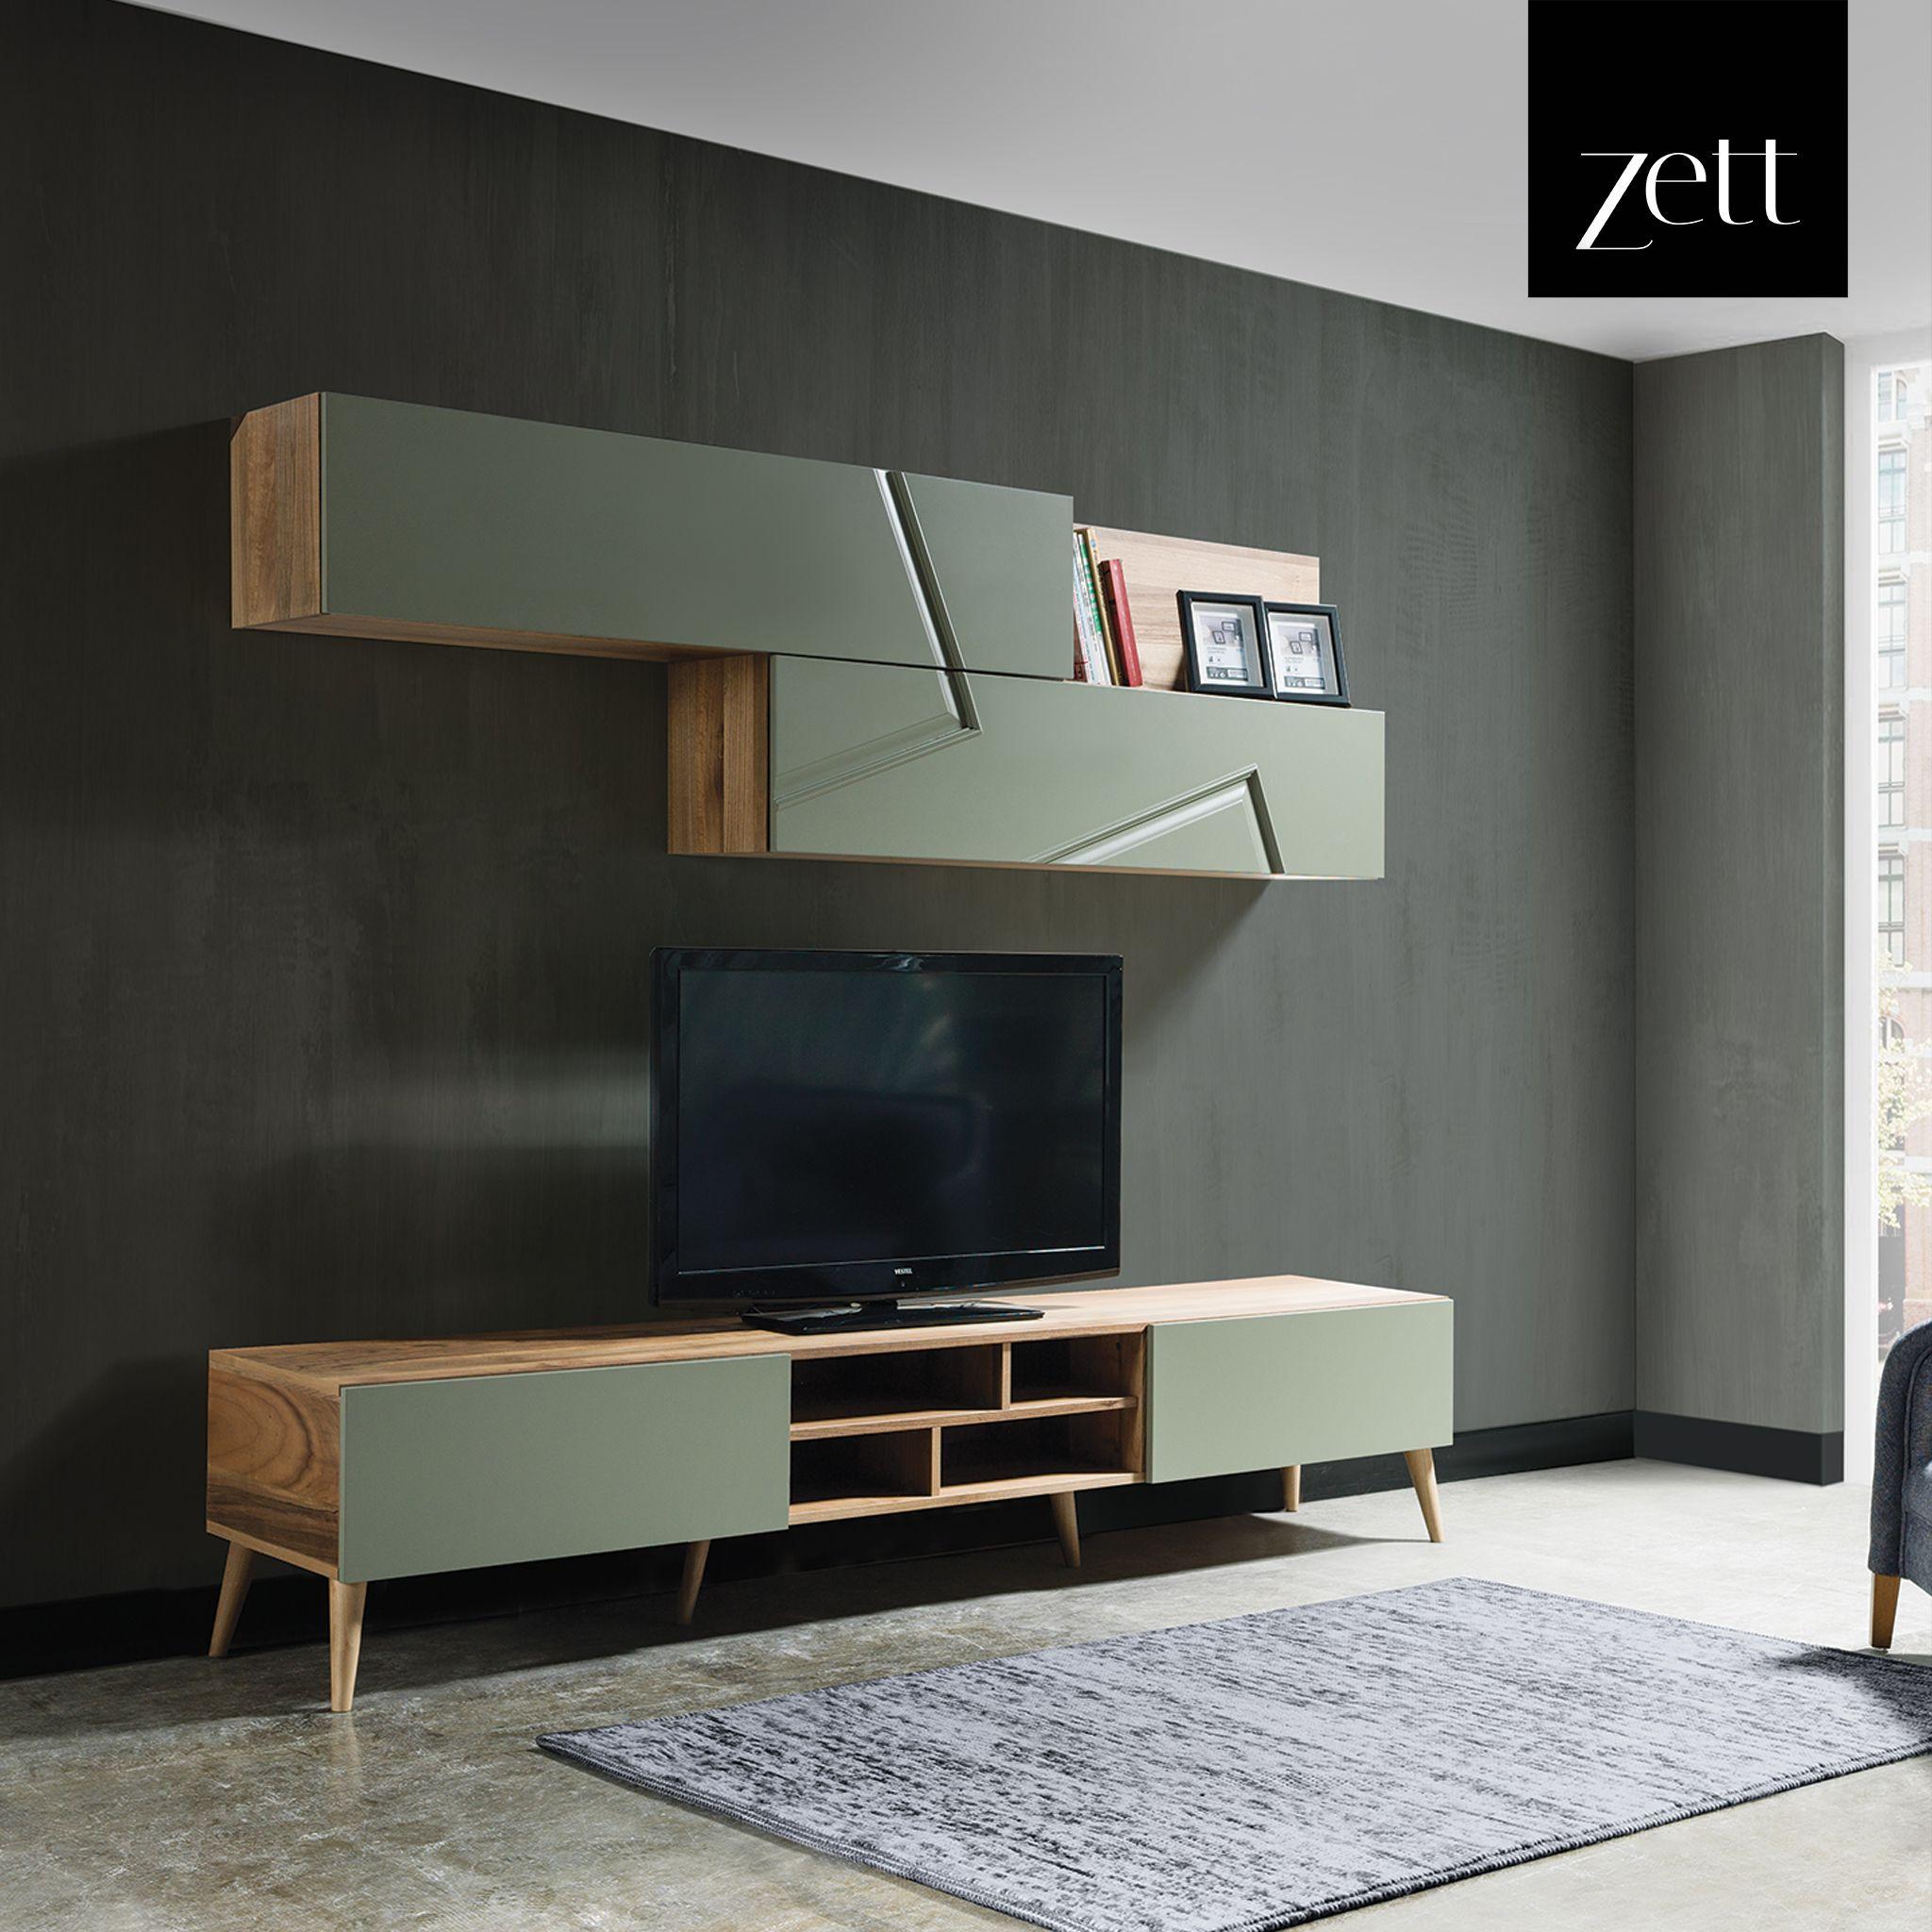 zettdekor mobilya furniture ahsap wooden yatakodasi bedroom yemekodasi diningroom unite tvwal tv room design italian furniture design tv unit design